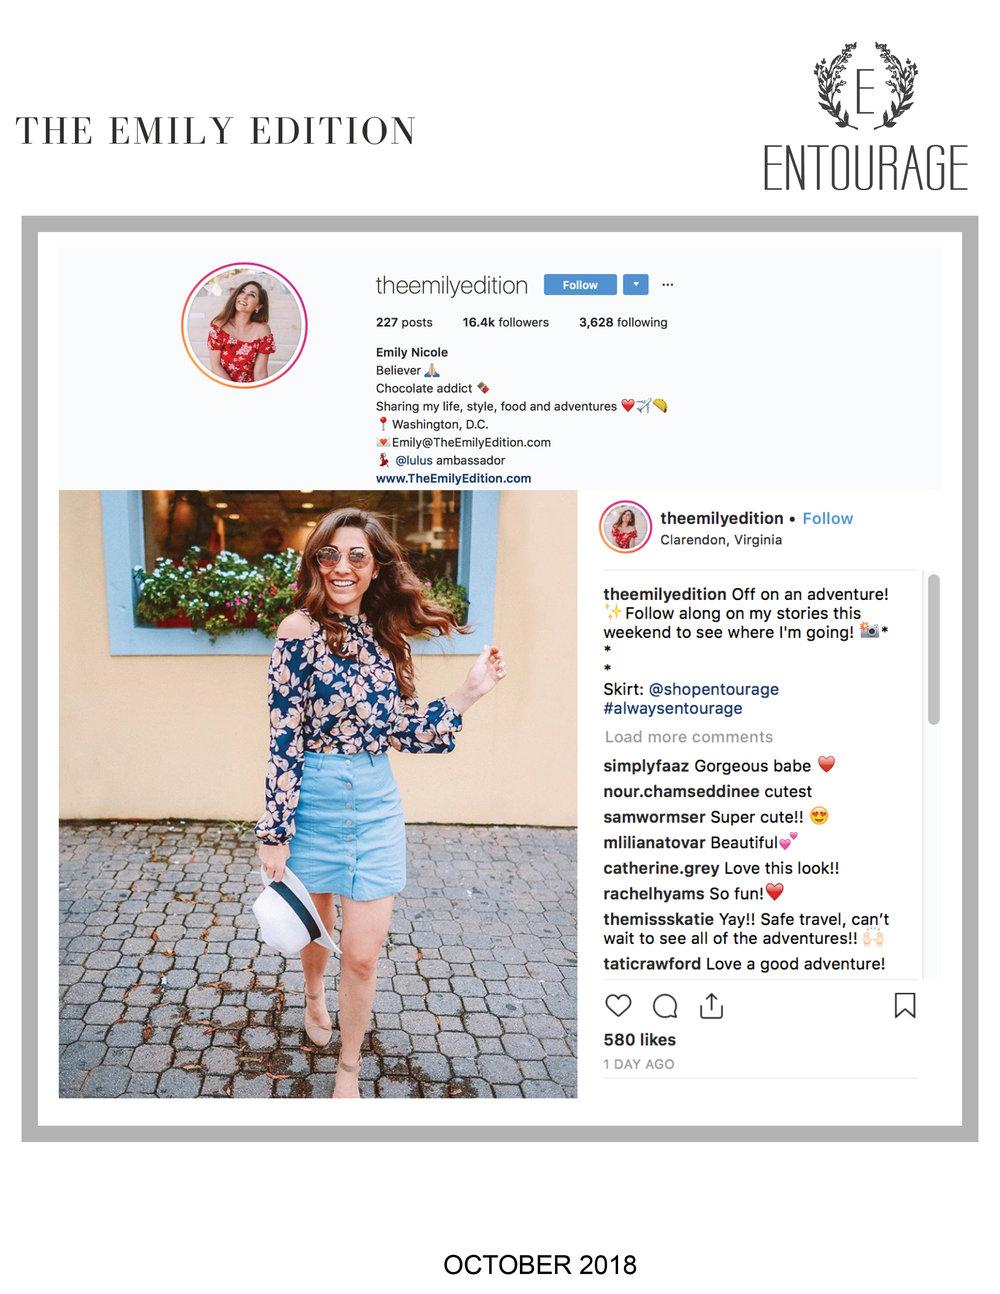 Entourage_EmilyNicole_October2018.jpg